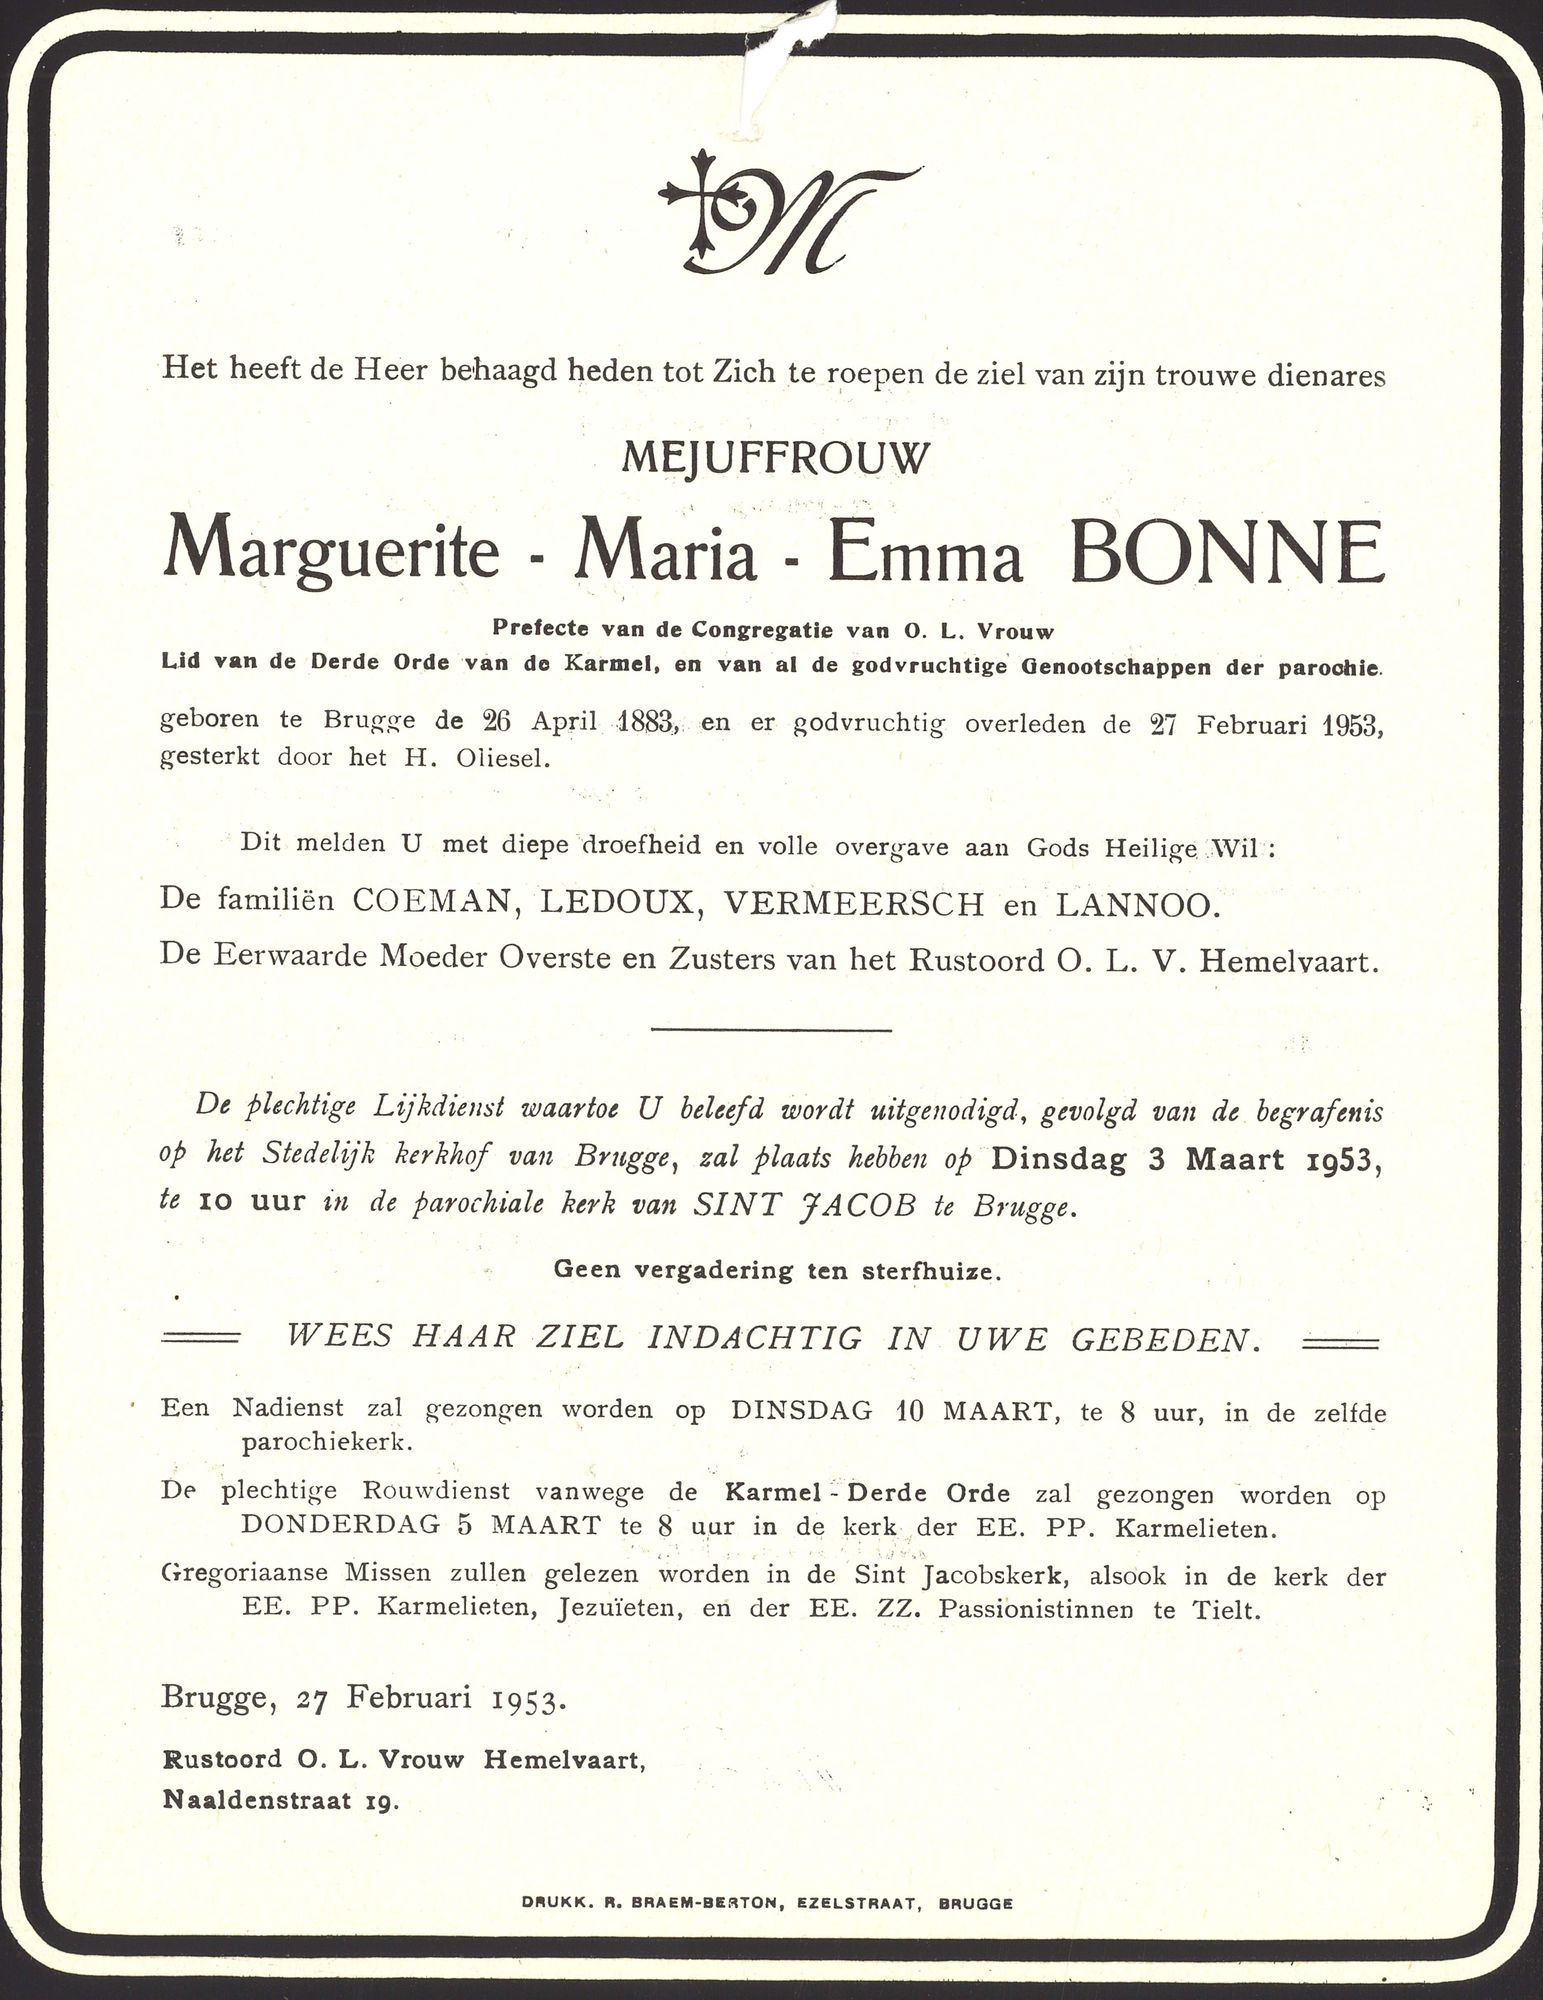 Marguerite-Maria-Emma Bonne